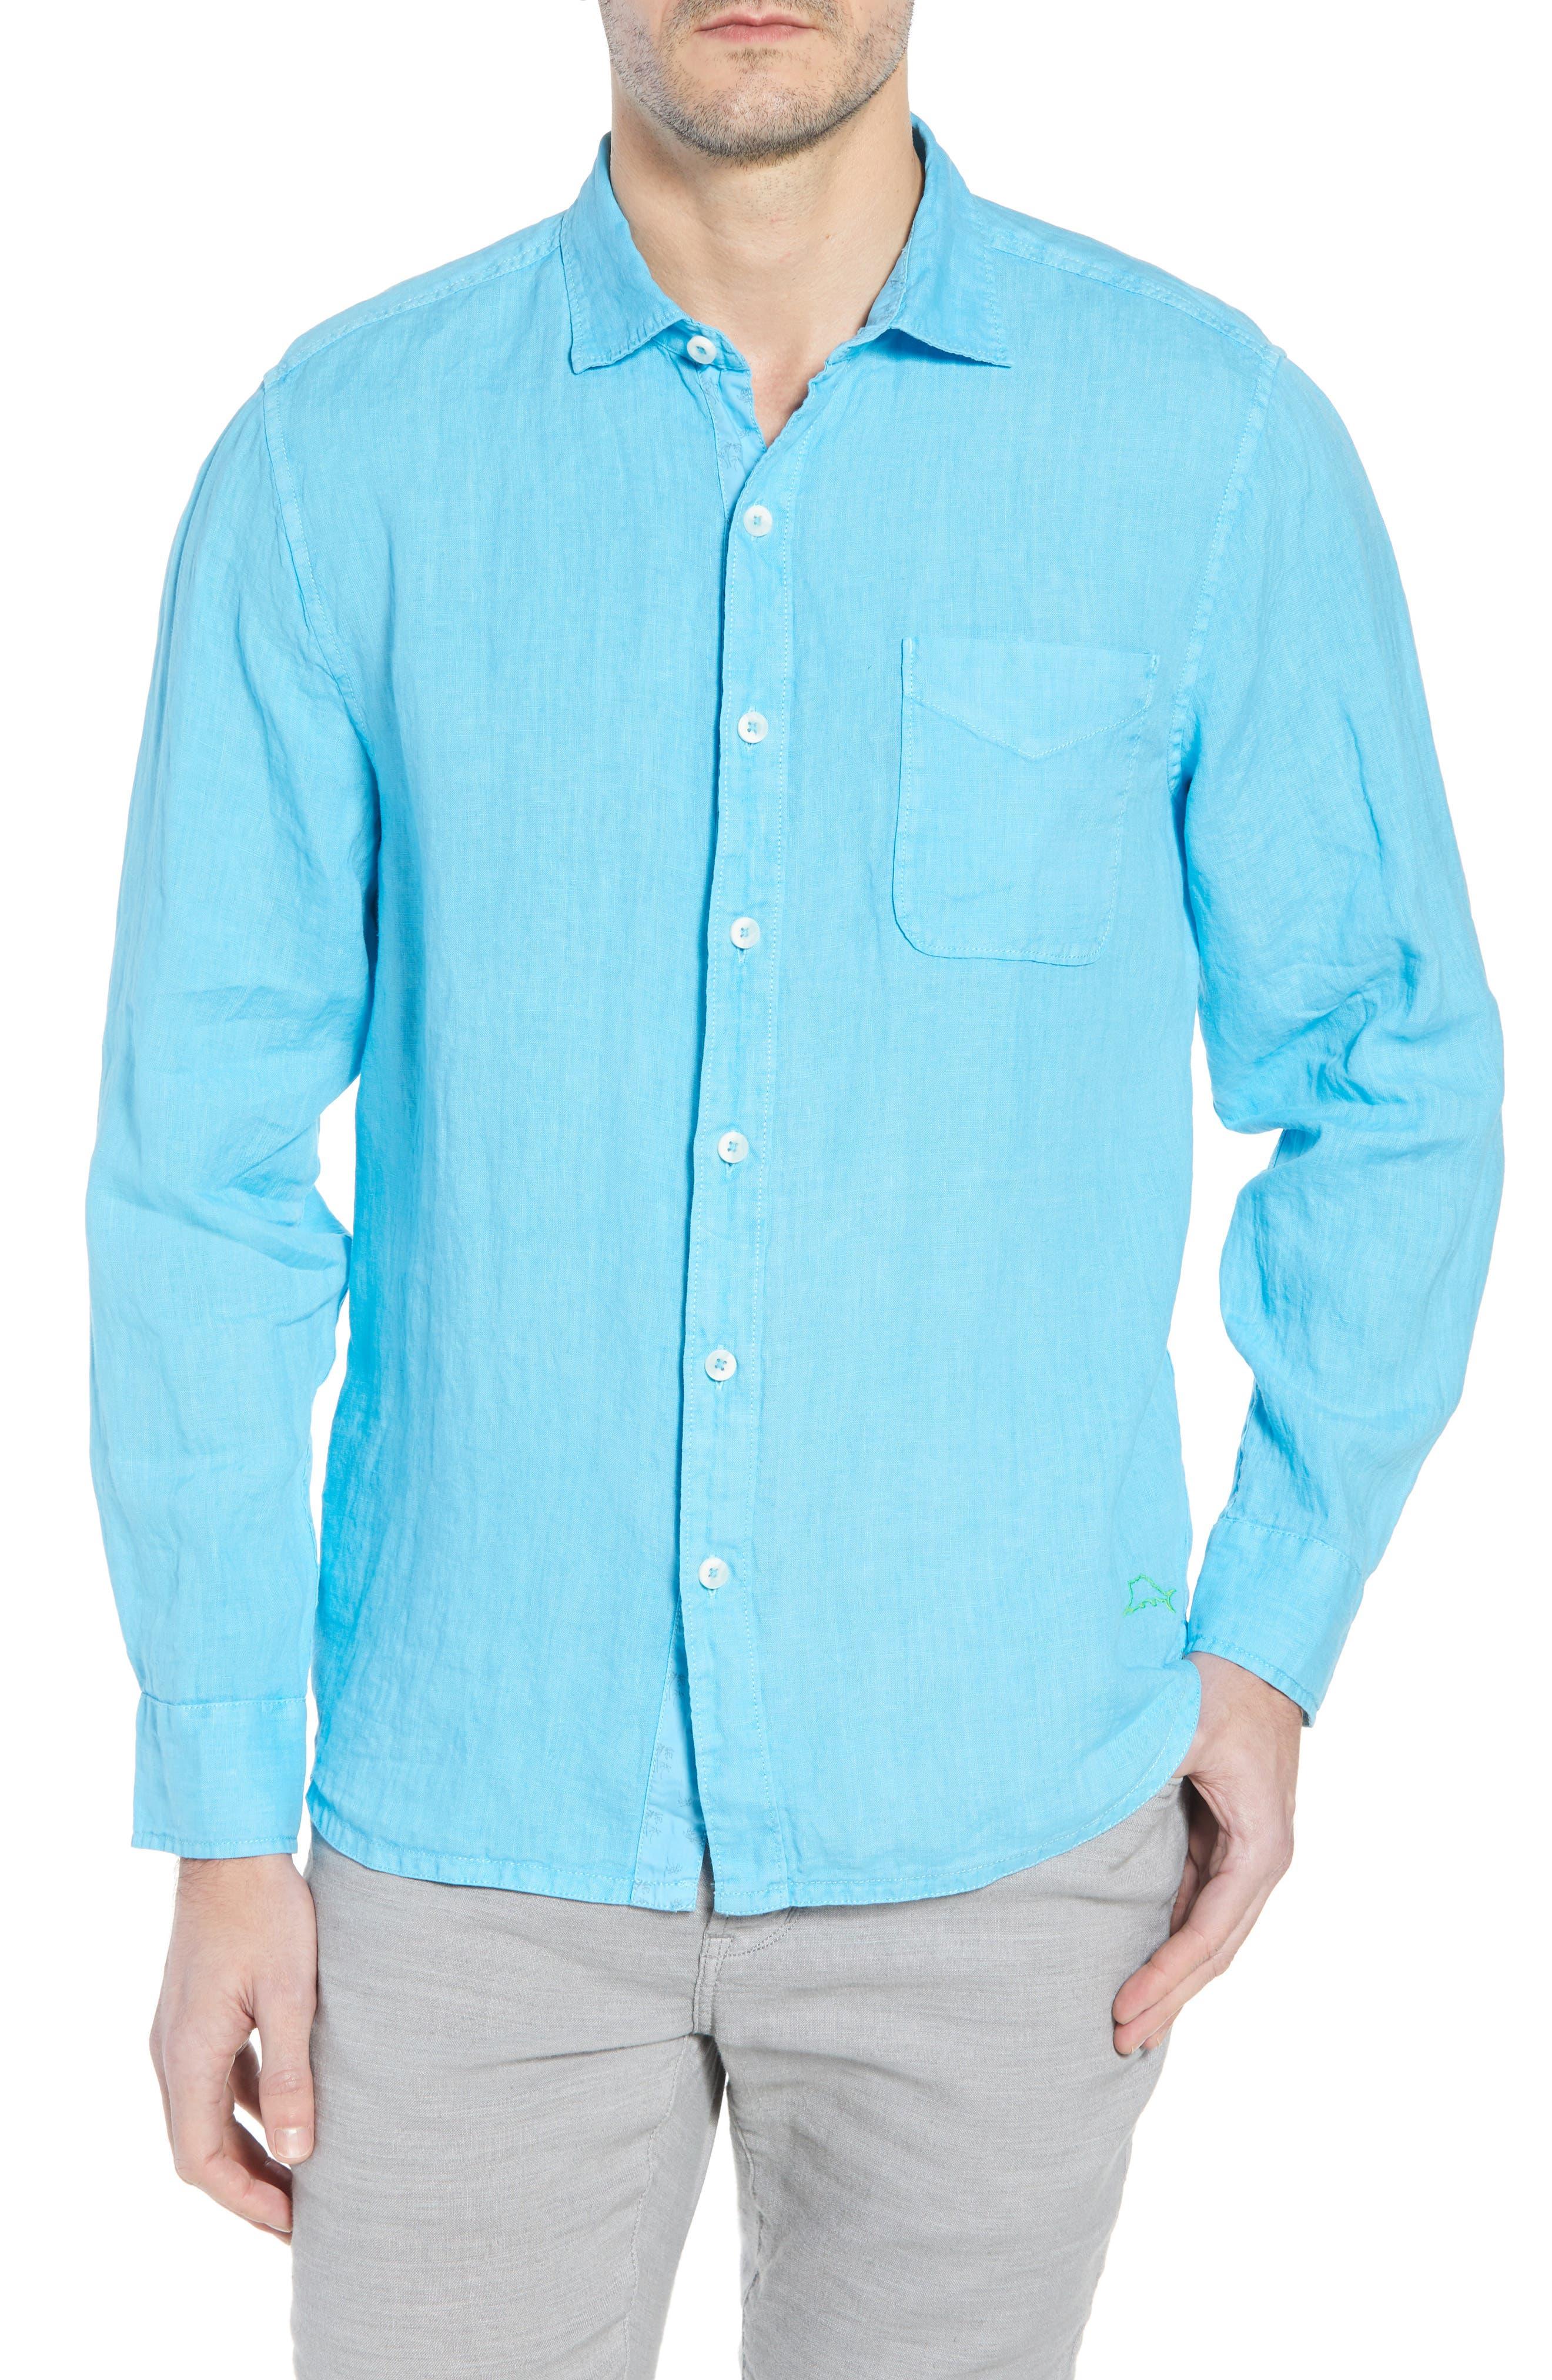 Seaspray Breezer Standard Fit Linen Sport Shirt,                             Main thumbnail 1, color,                             POOL PARTY BLUE